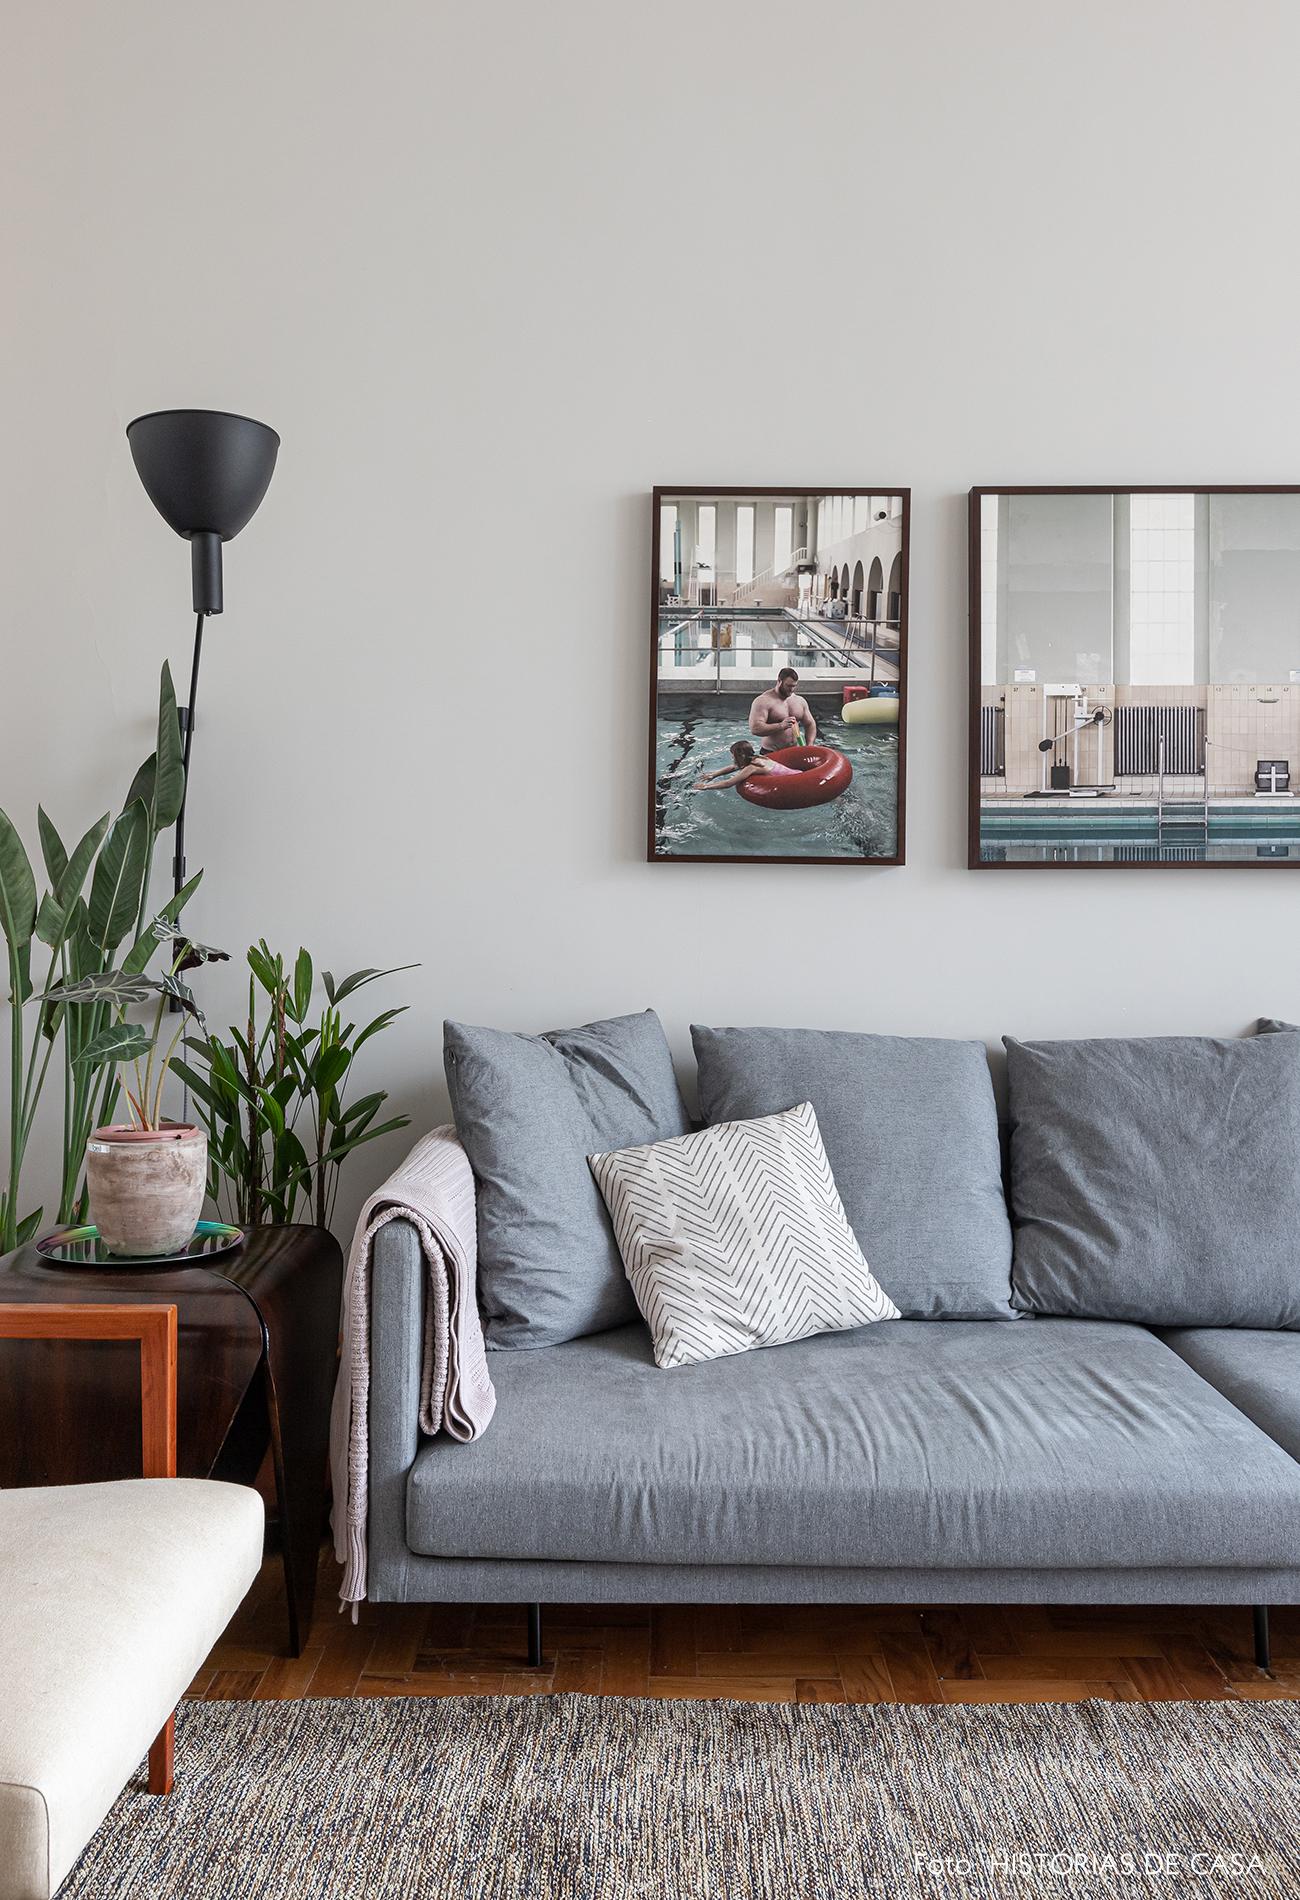 sala-sofa-cinza-tapete-cinza-poltrona-branca-quadros-fotografia